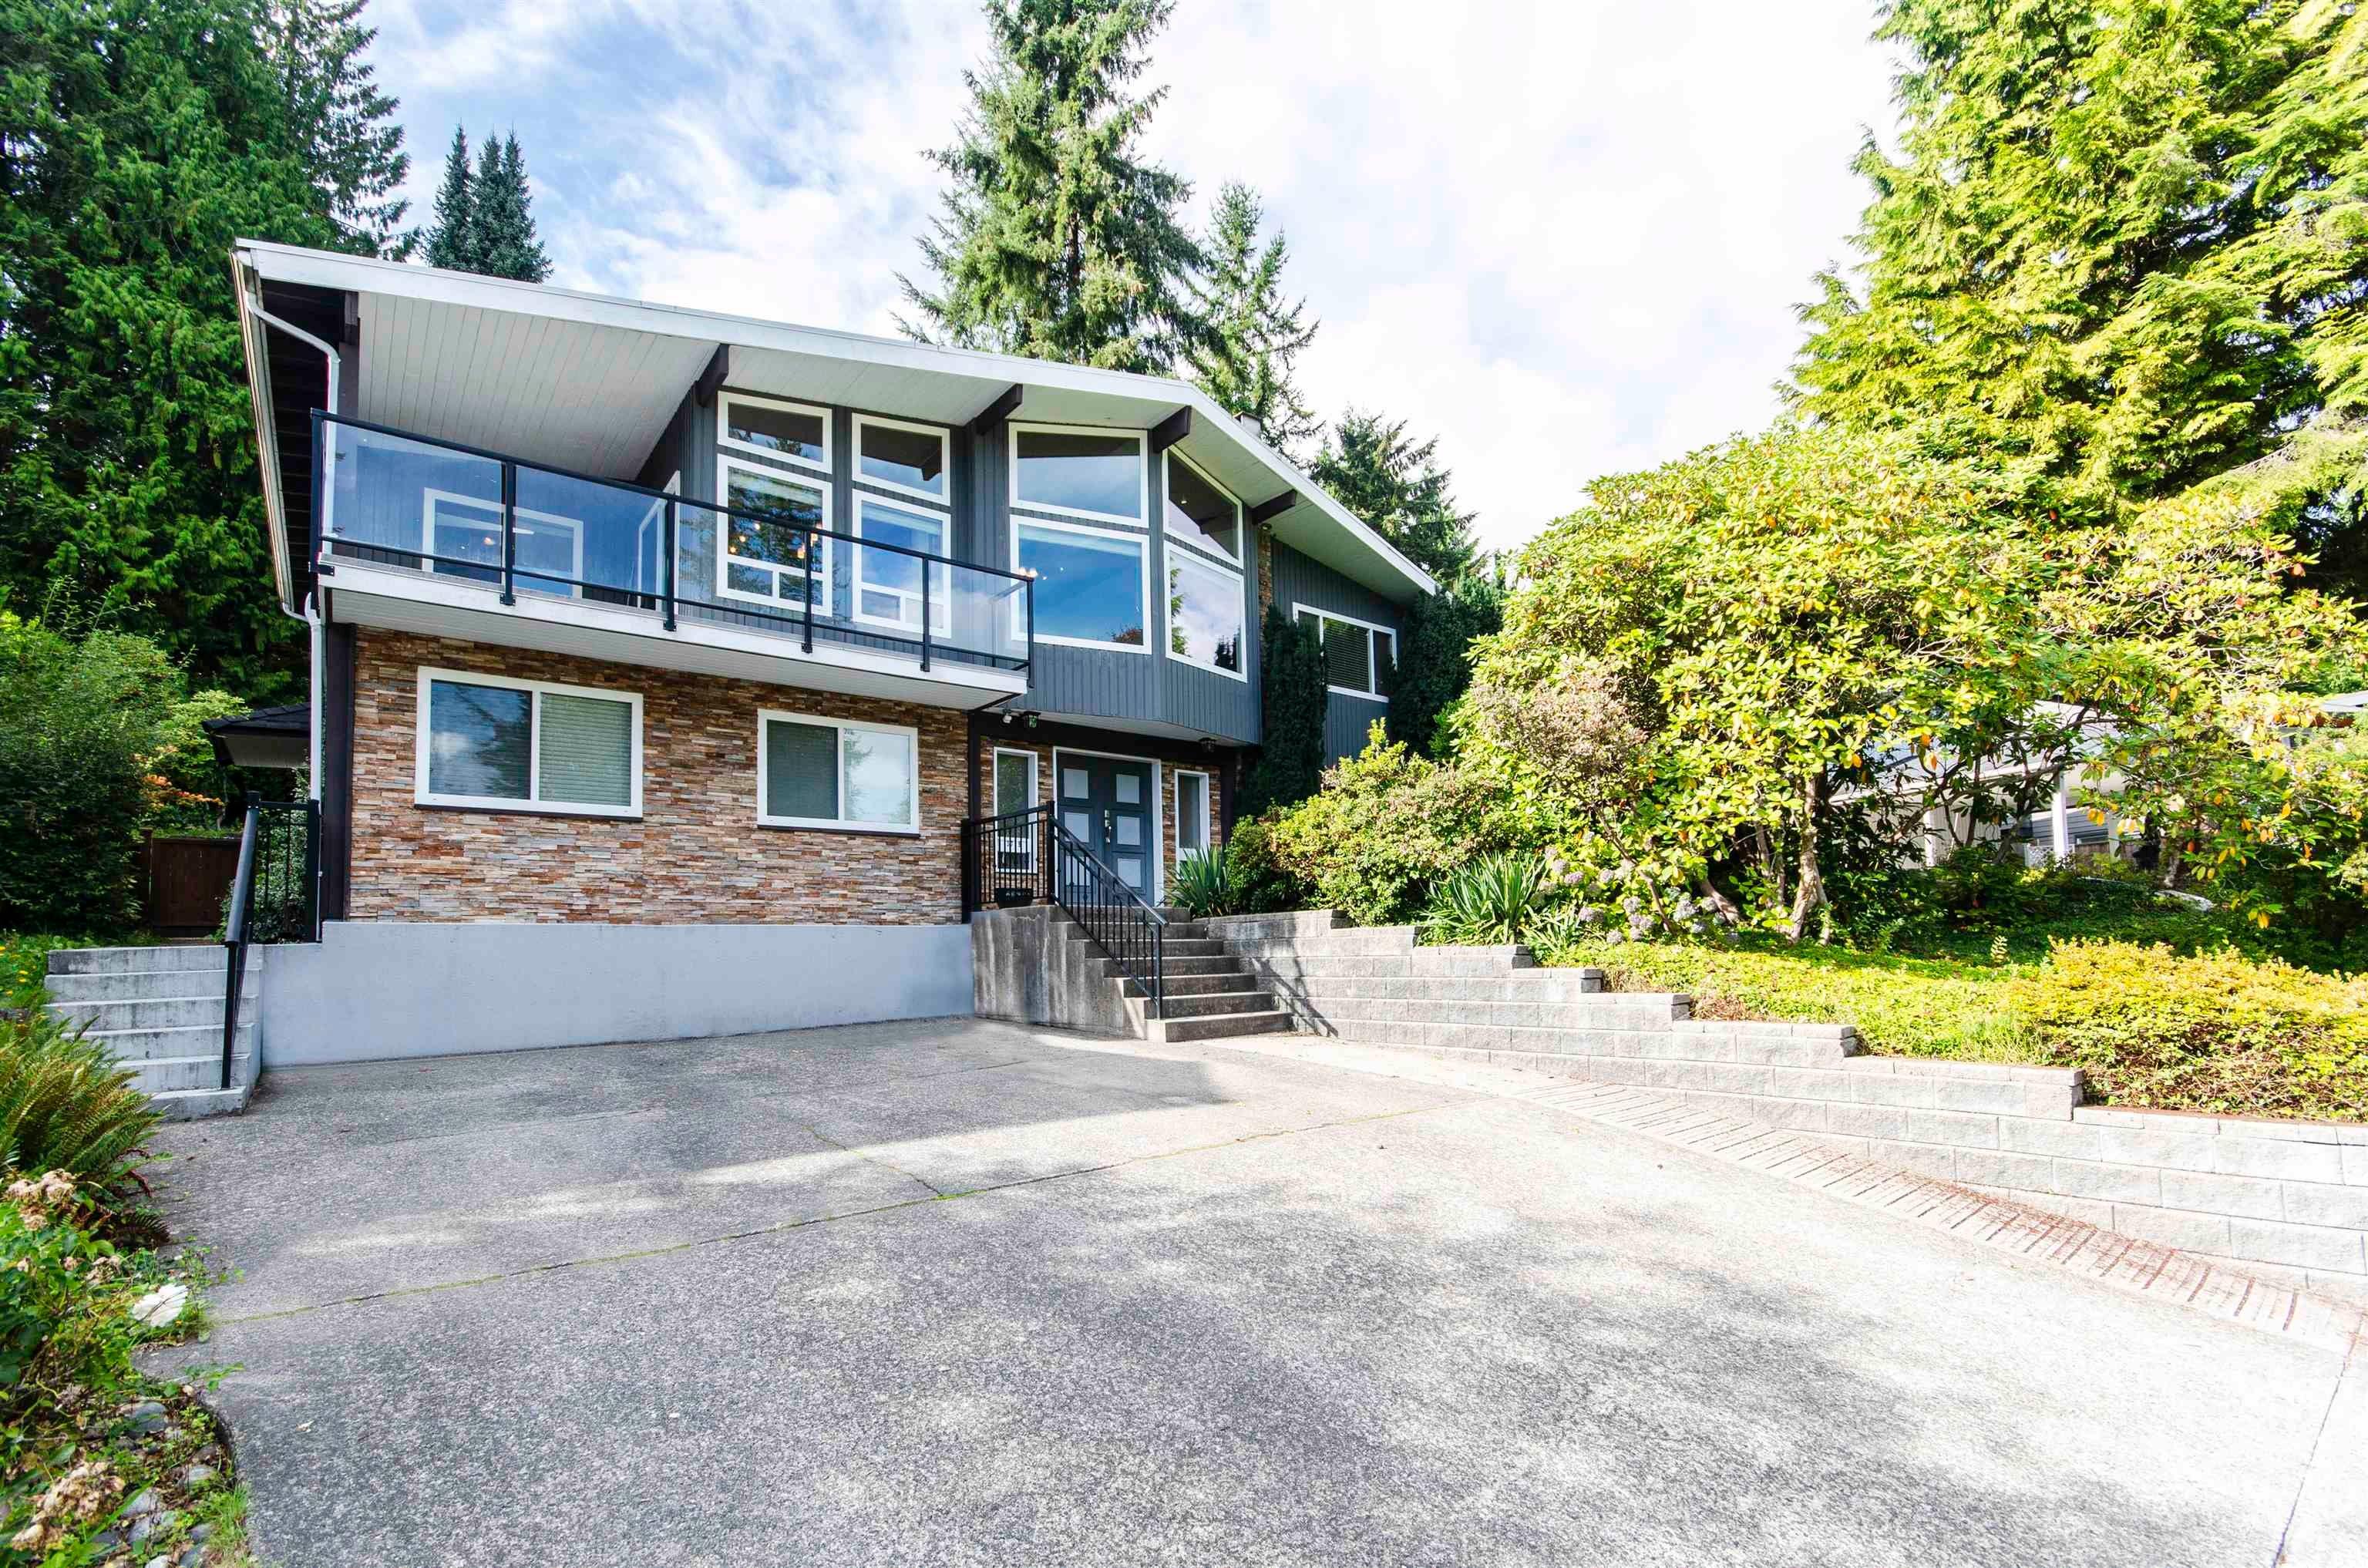 3785 REGENT AVENUE - Upper Lonsdale House/Single Family for sale, 4 Bedrooms (R2617648) - #29